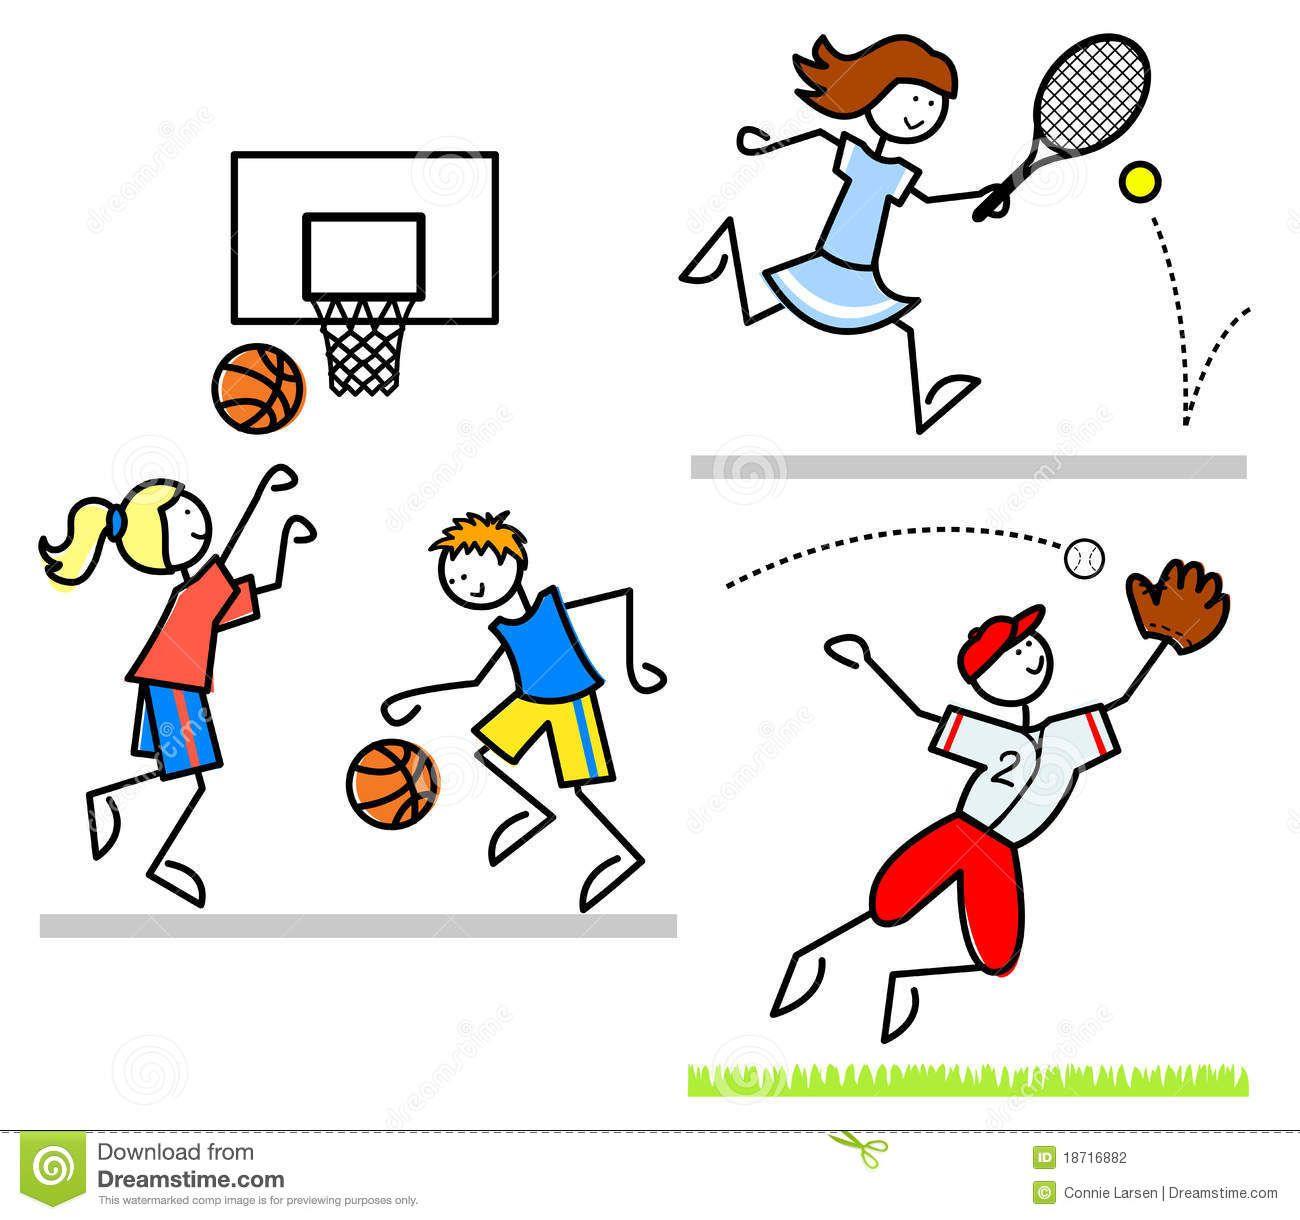 Sports cartoon kidseps.